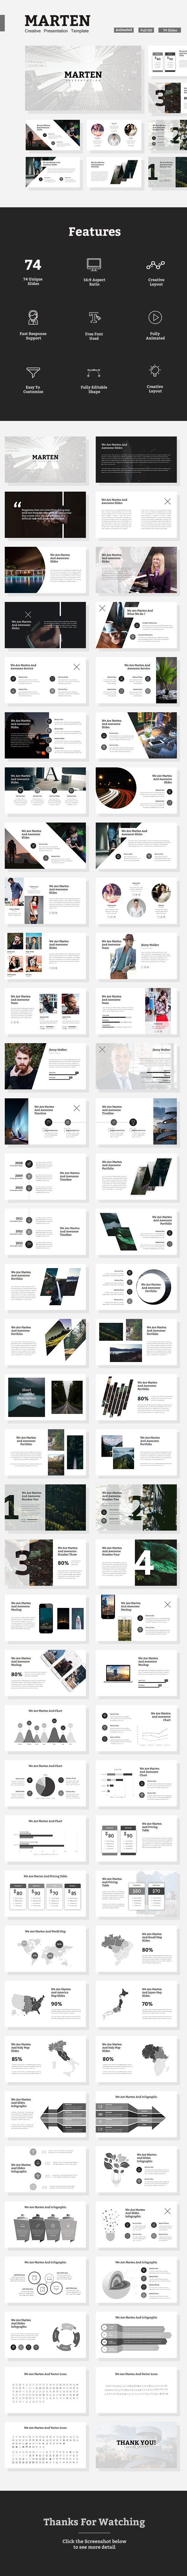 Marten - Creative Powerpoint Template - Creative PowerPoint Templates